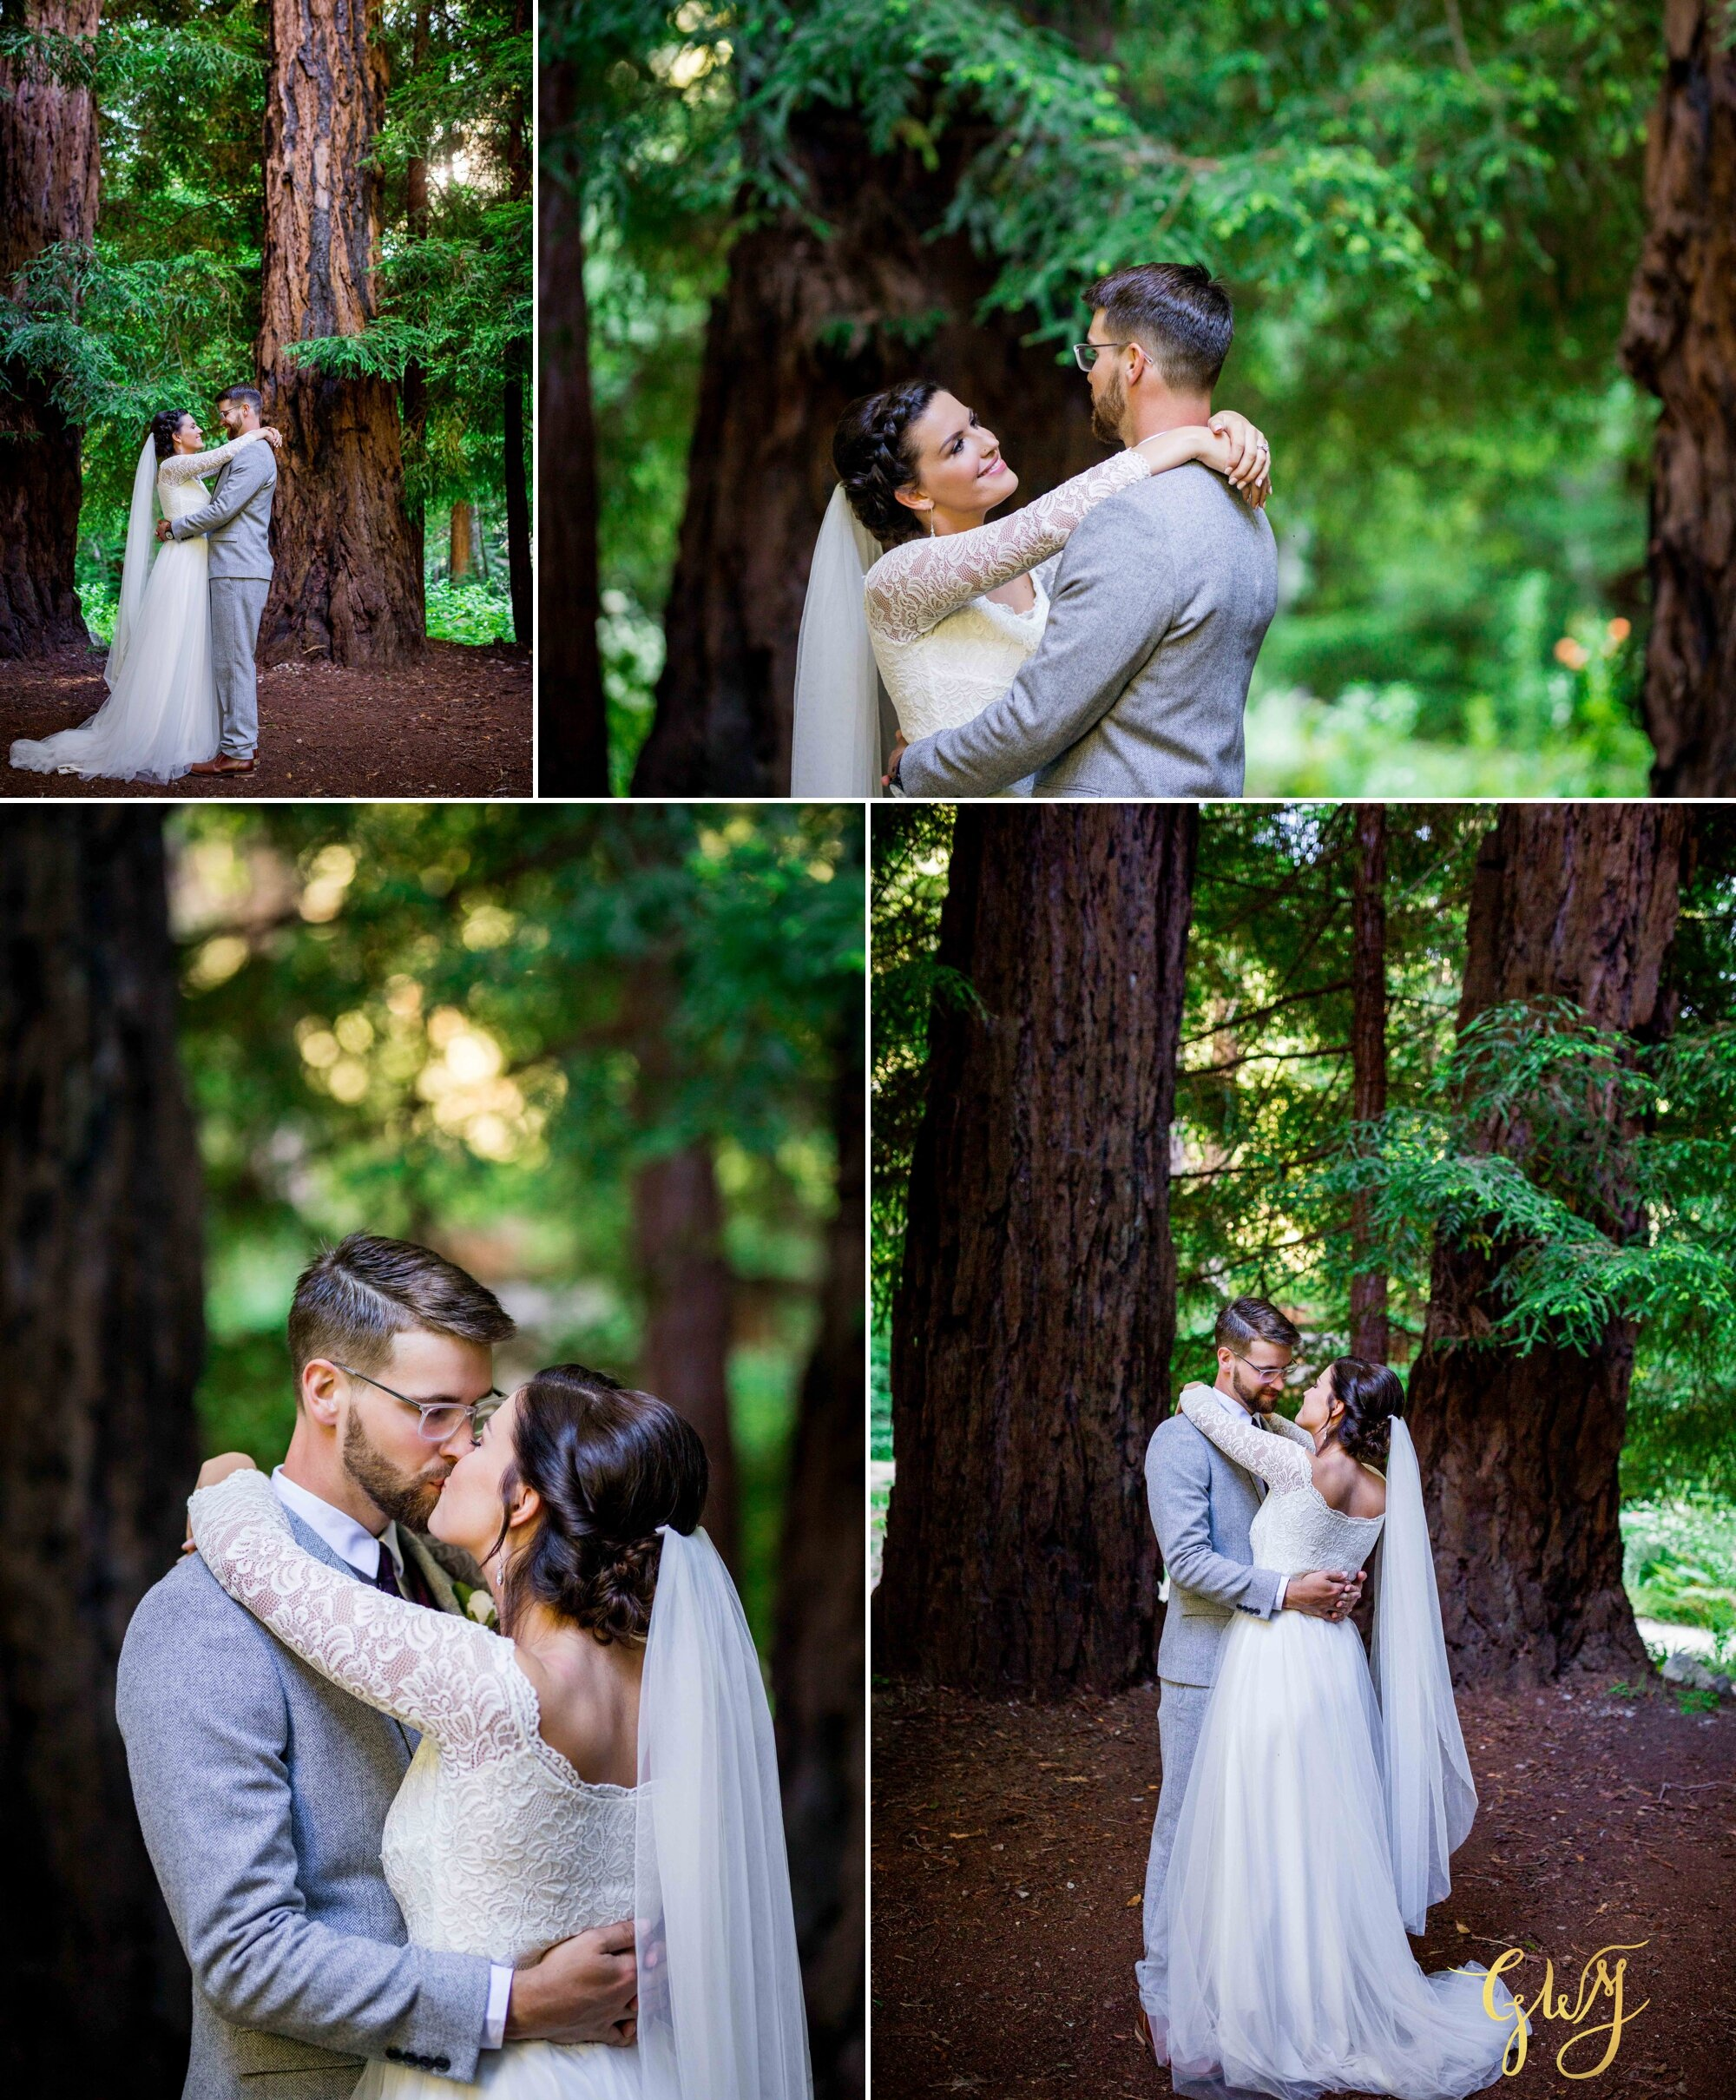 Casey + Jordan's Intimate Big Sur Elopement in the Redwoods by Glass Woods Media - 2 5.jpg